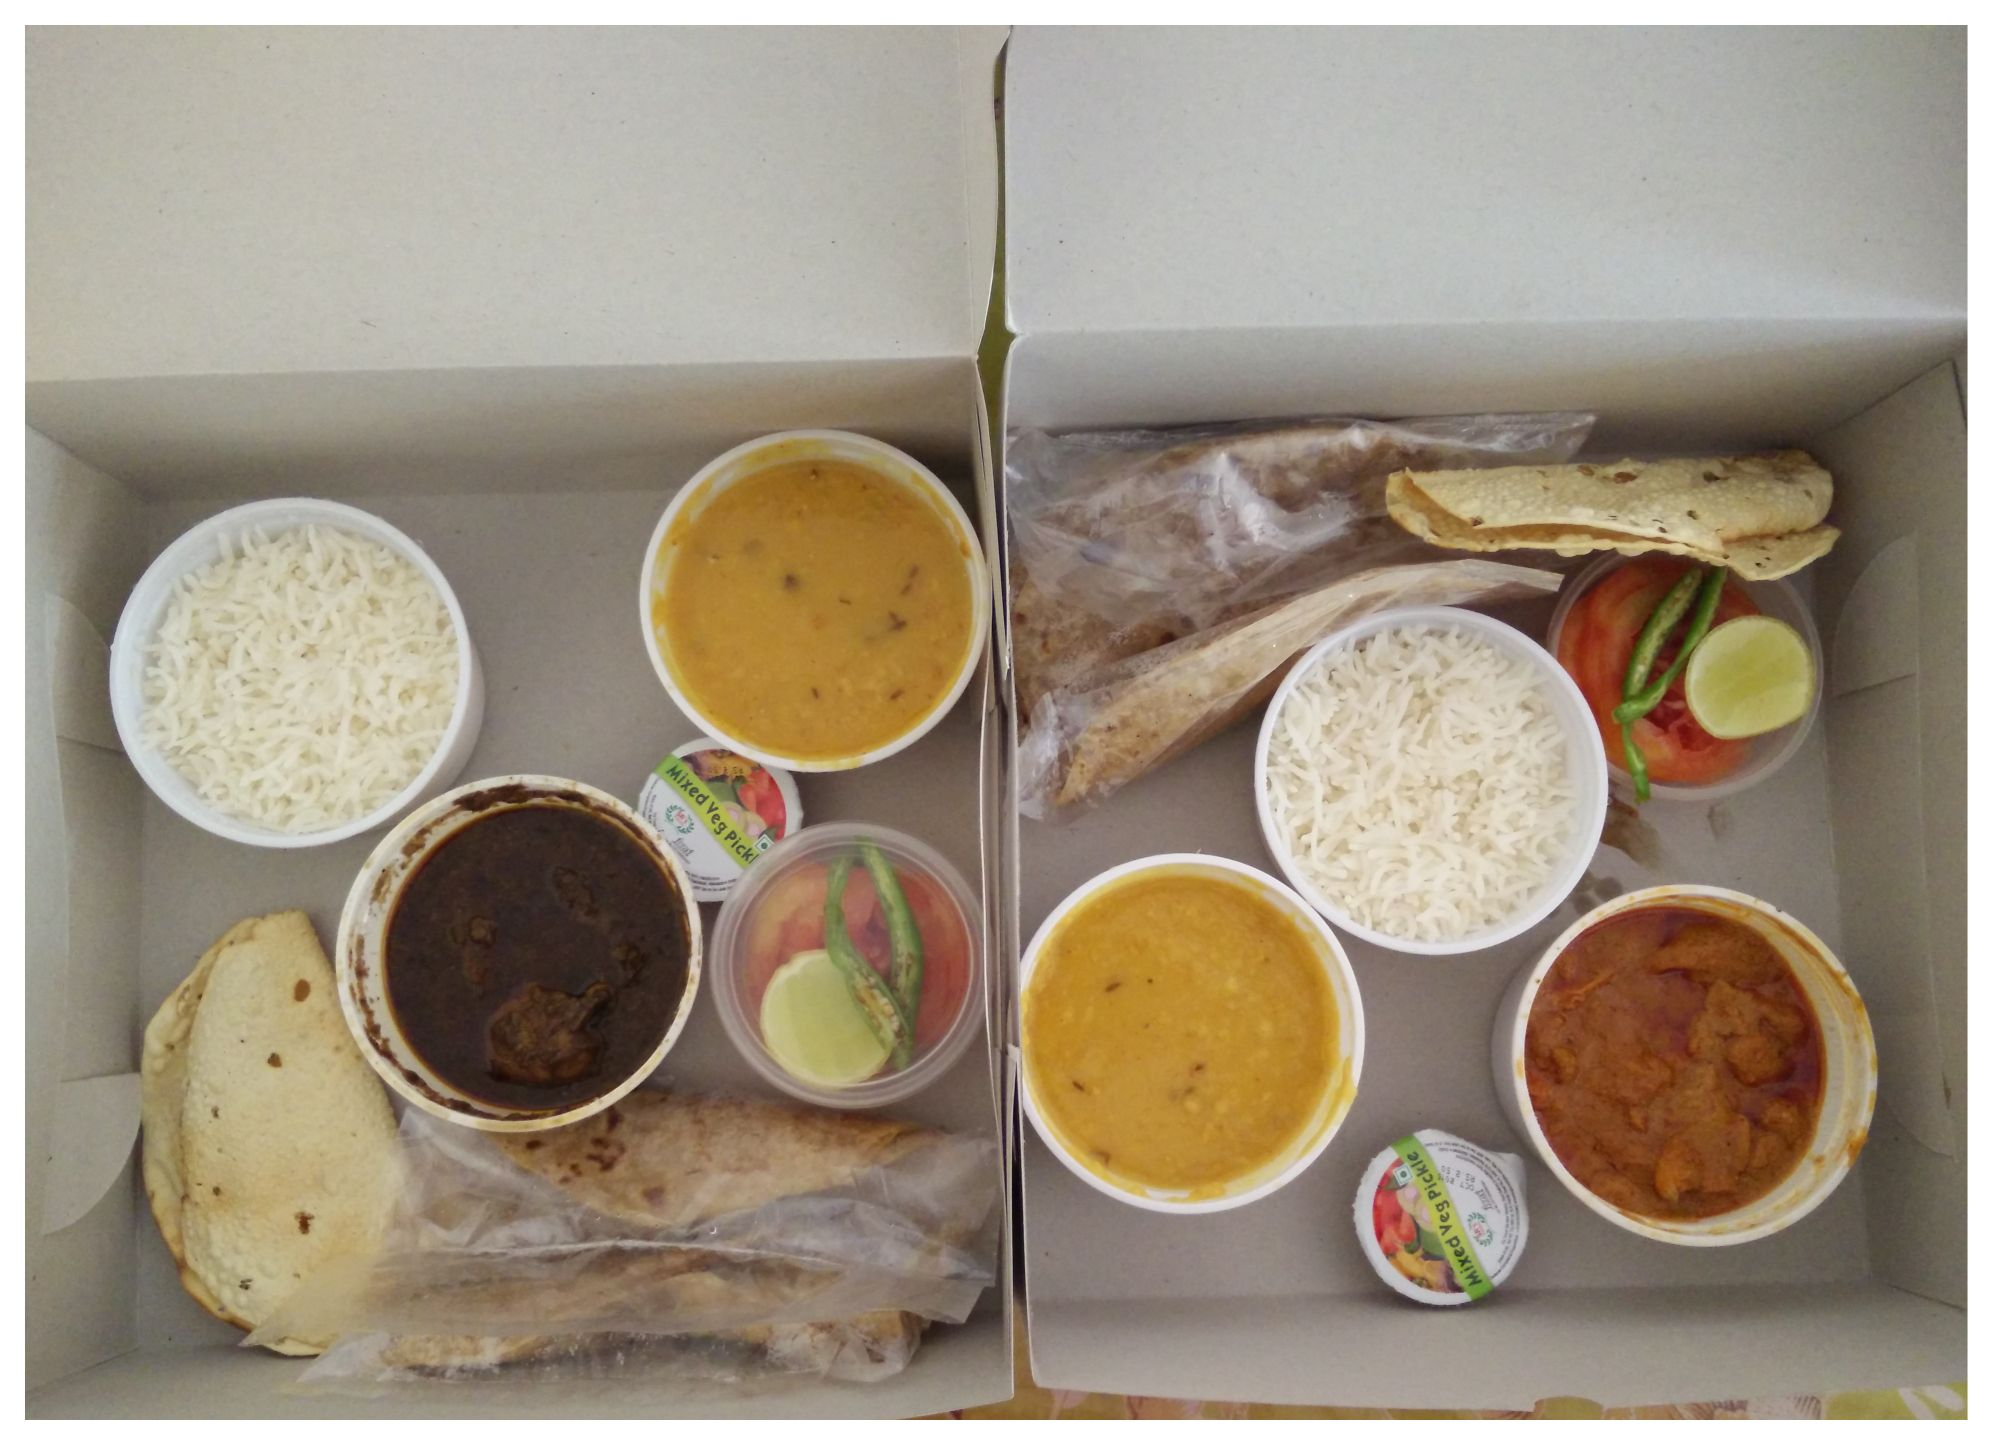 Khanabadosh Lunchbox